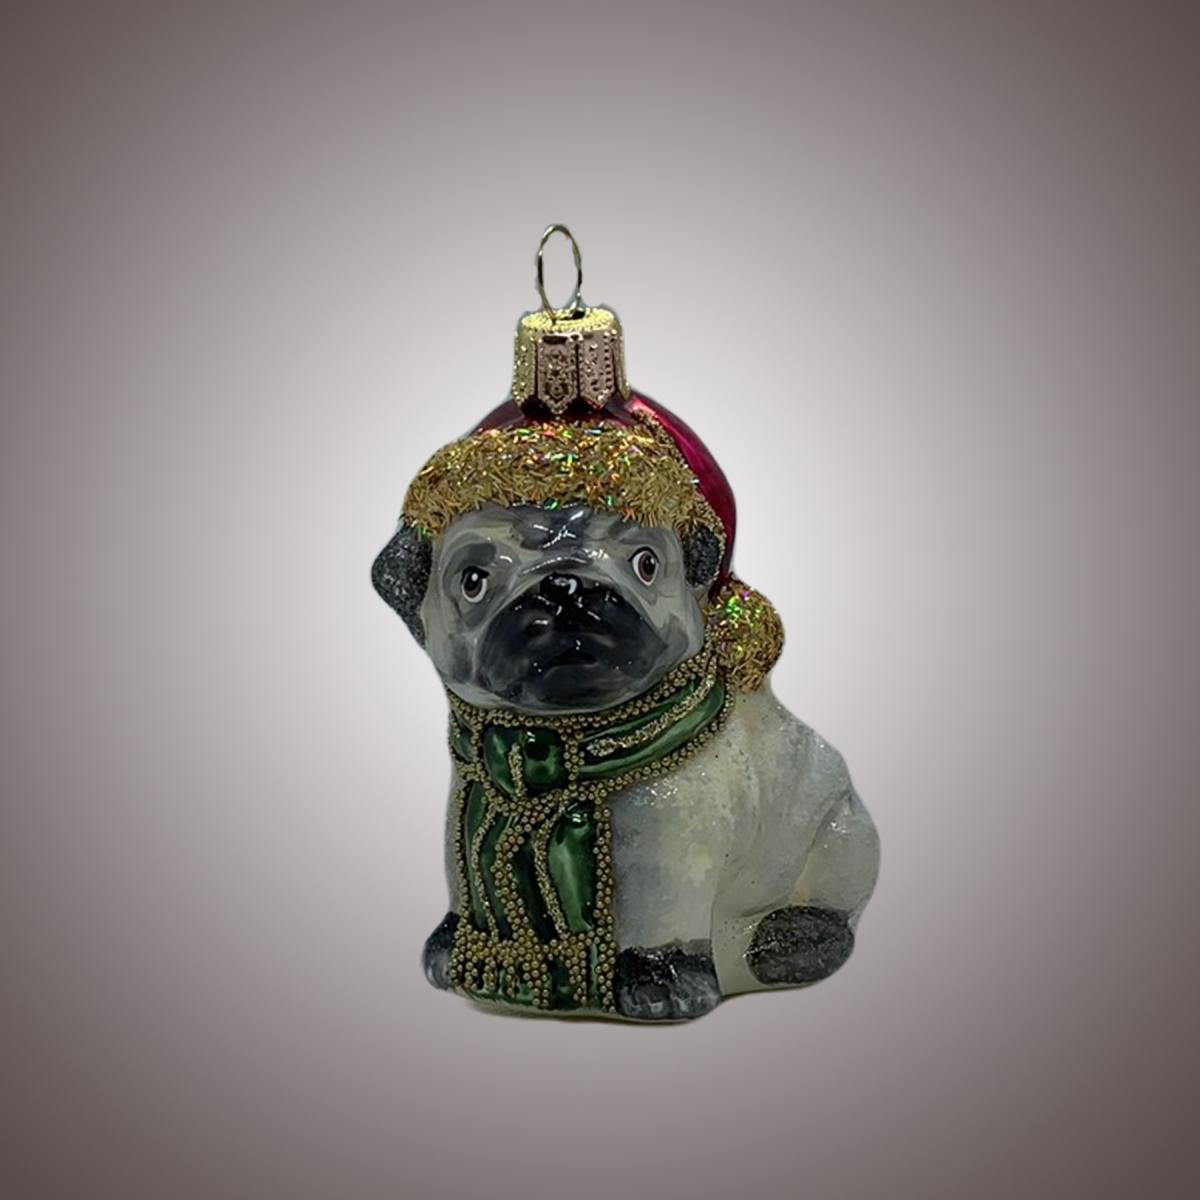 Собачка мопс в шапочке Санты